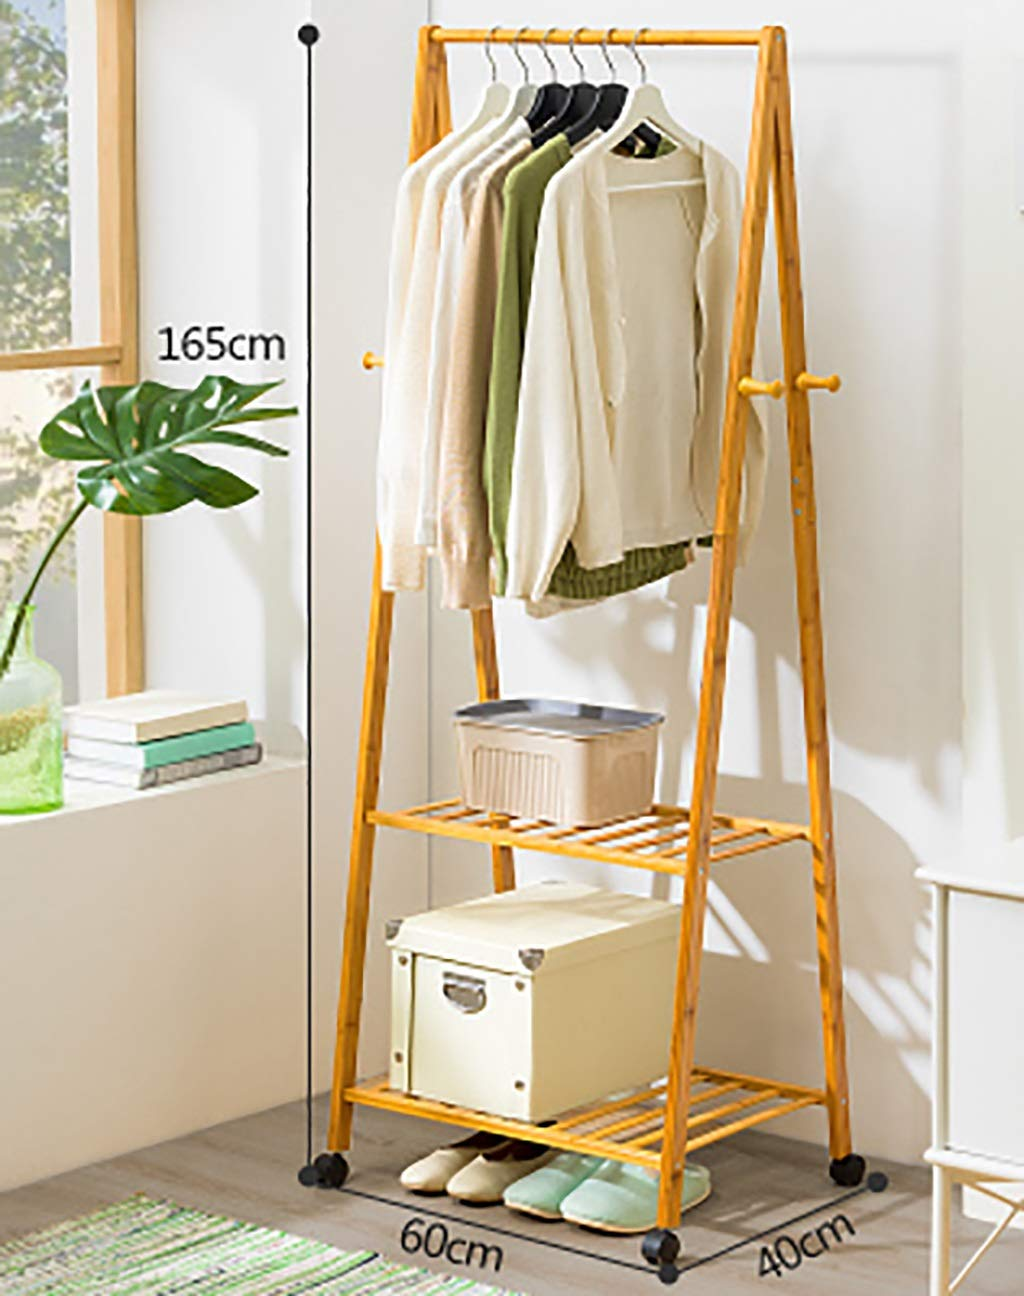 B 6040165cm Coat Stand,Housewares Standing Coat and Hat Rack Bamboo Wooden Creative Storage Shelves Hanger